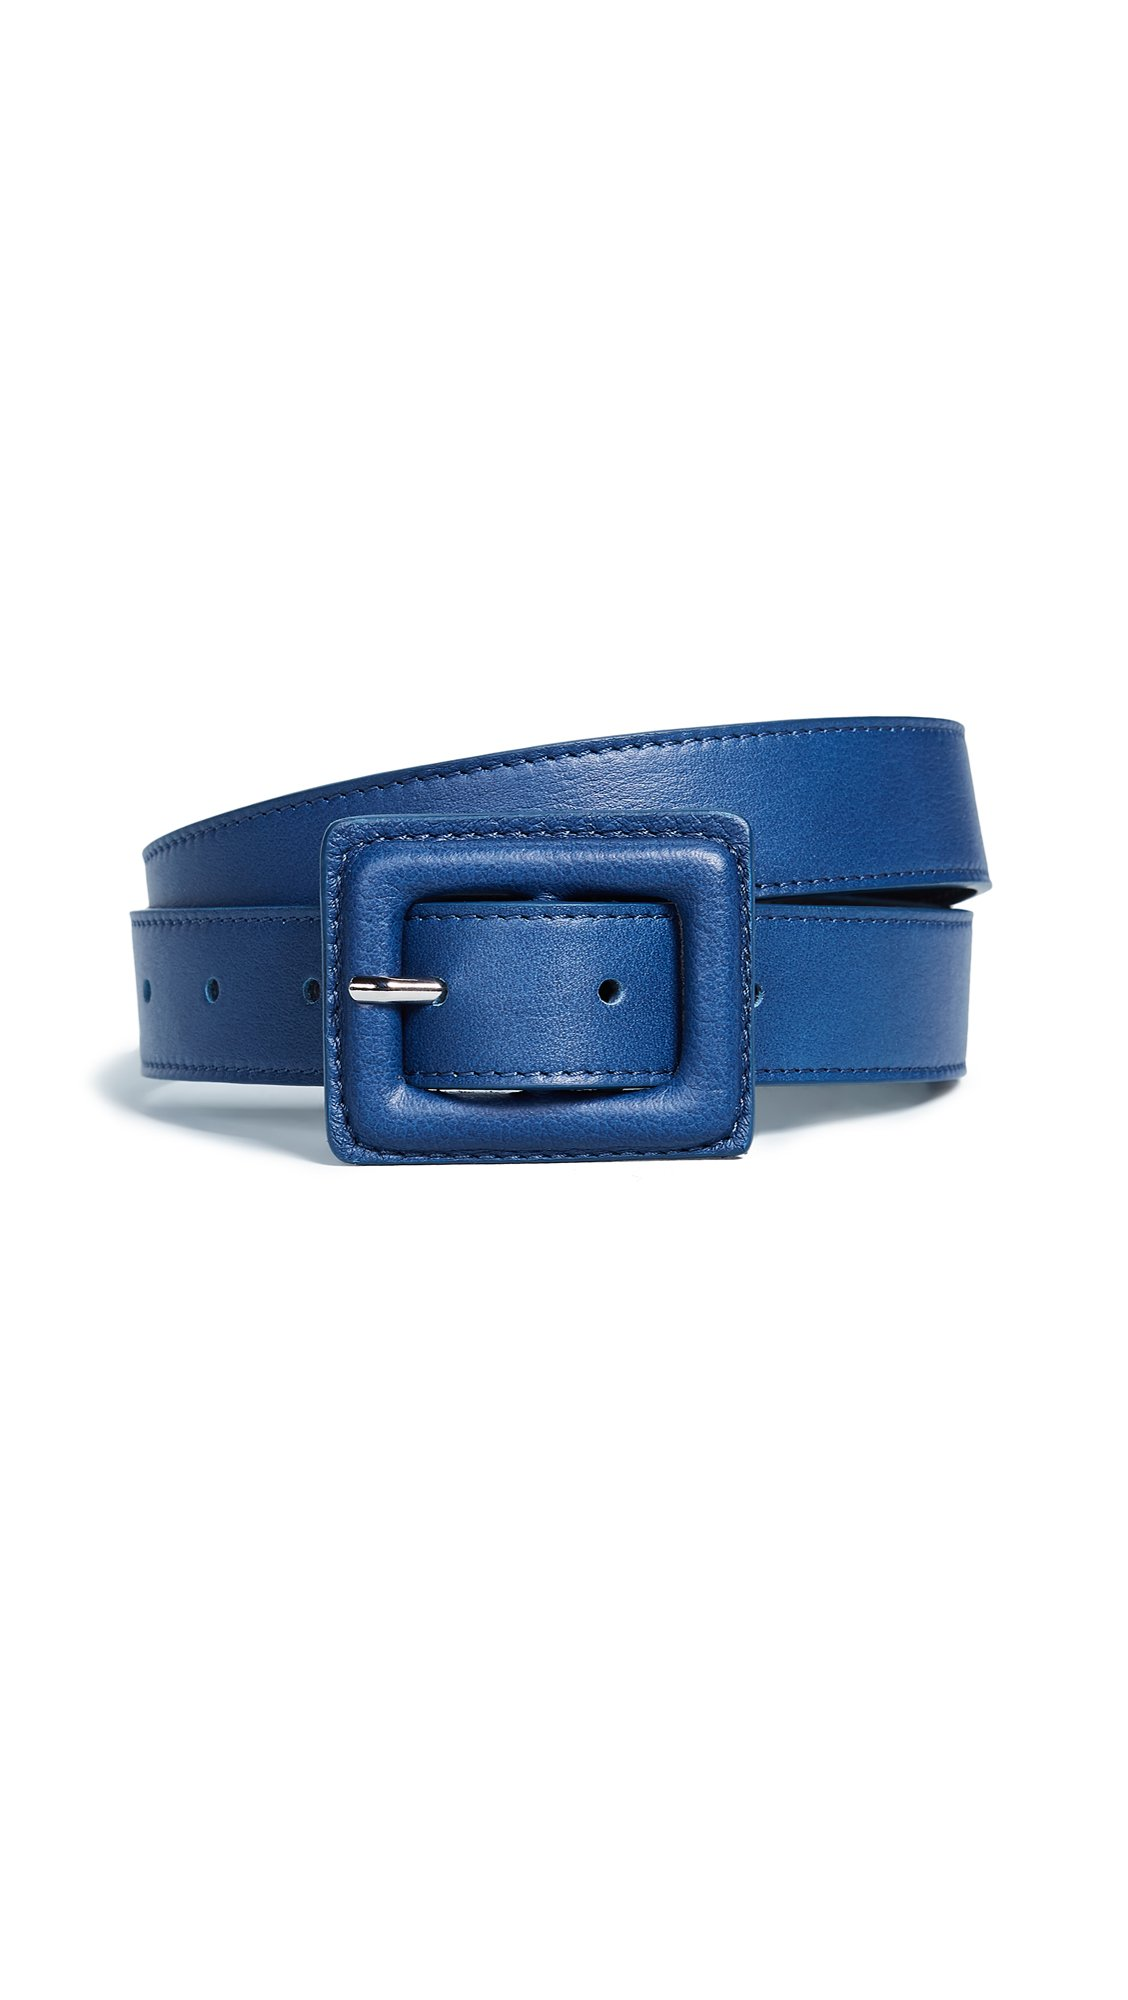 B-Low The Belt Women's Ana Mini Vibrant Belt, Cobalt, Small